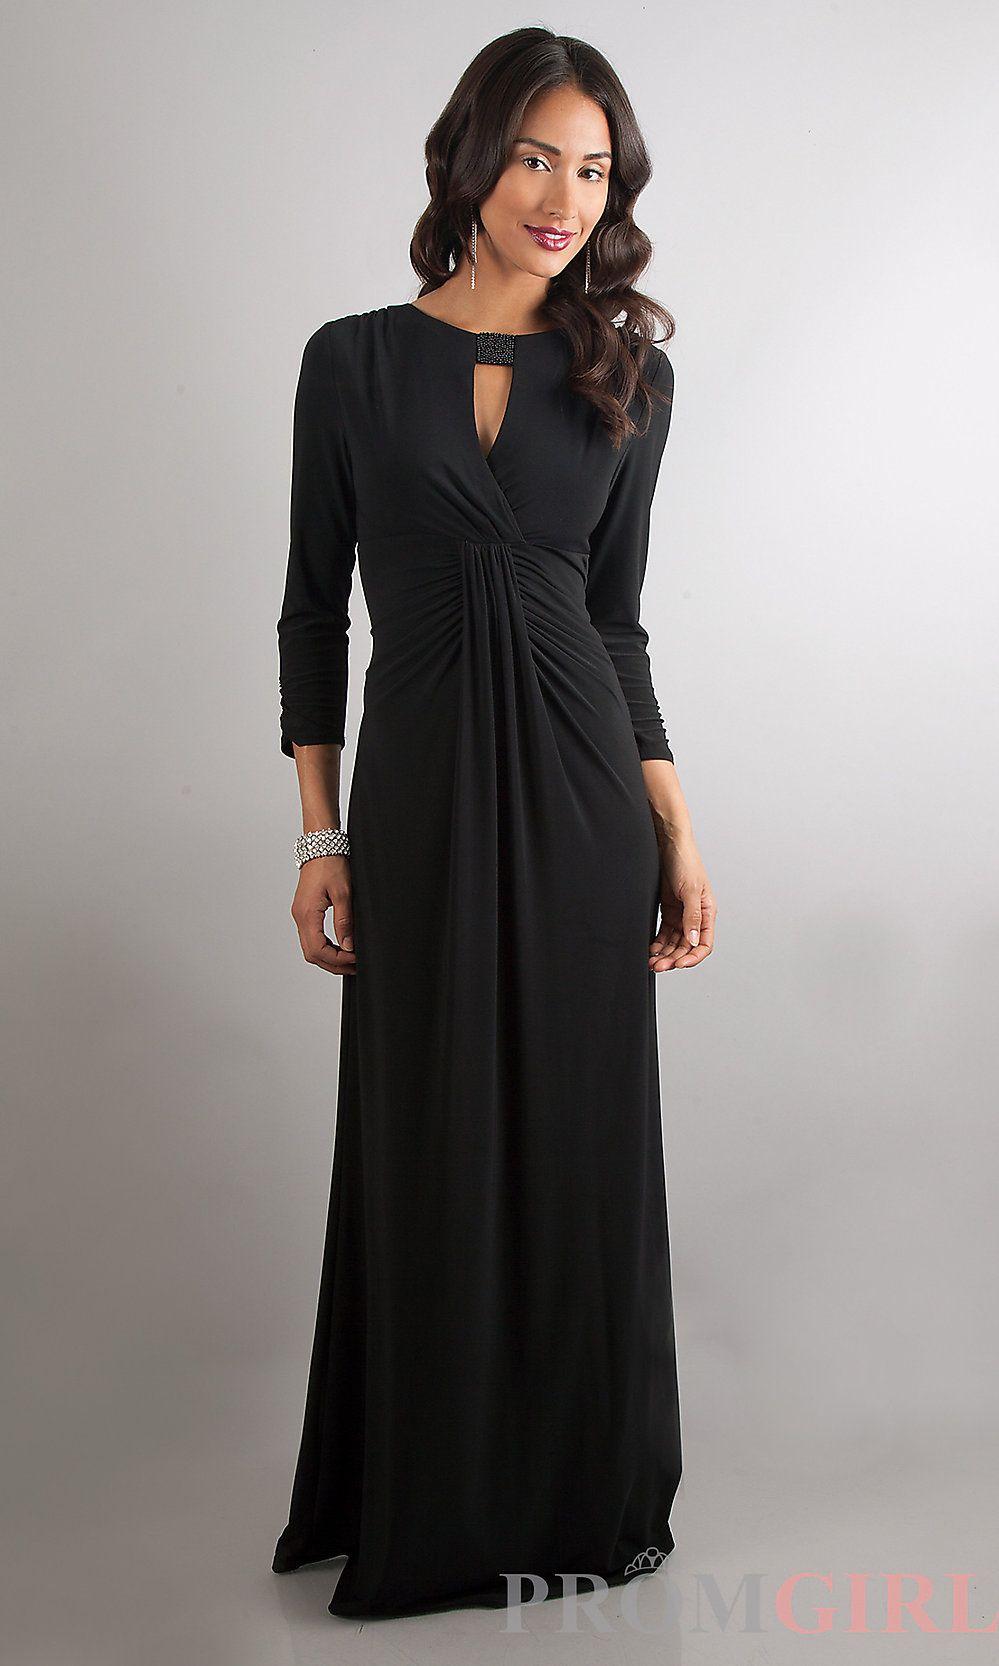 Long sleeve black wedding dresses  Classy black long dress  Loving the look   Dresses  Pinterest